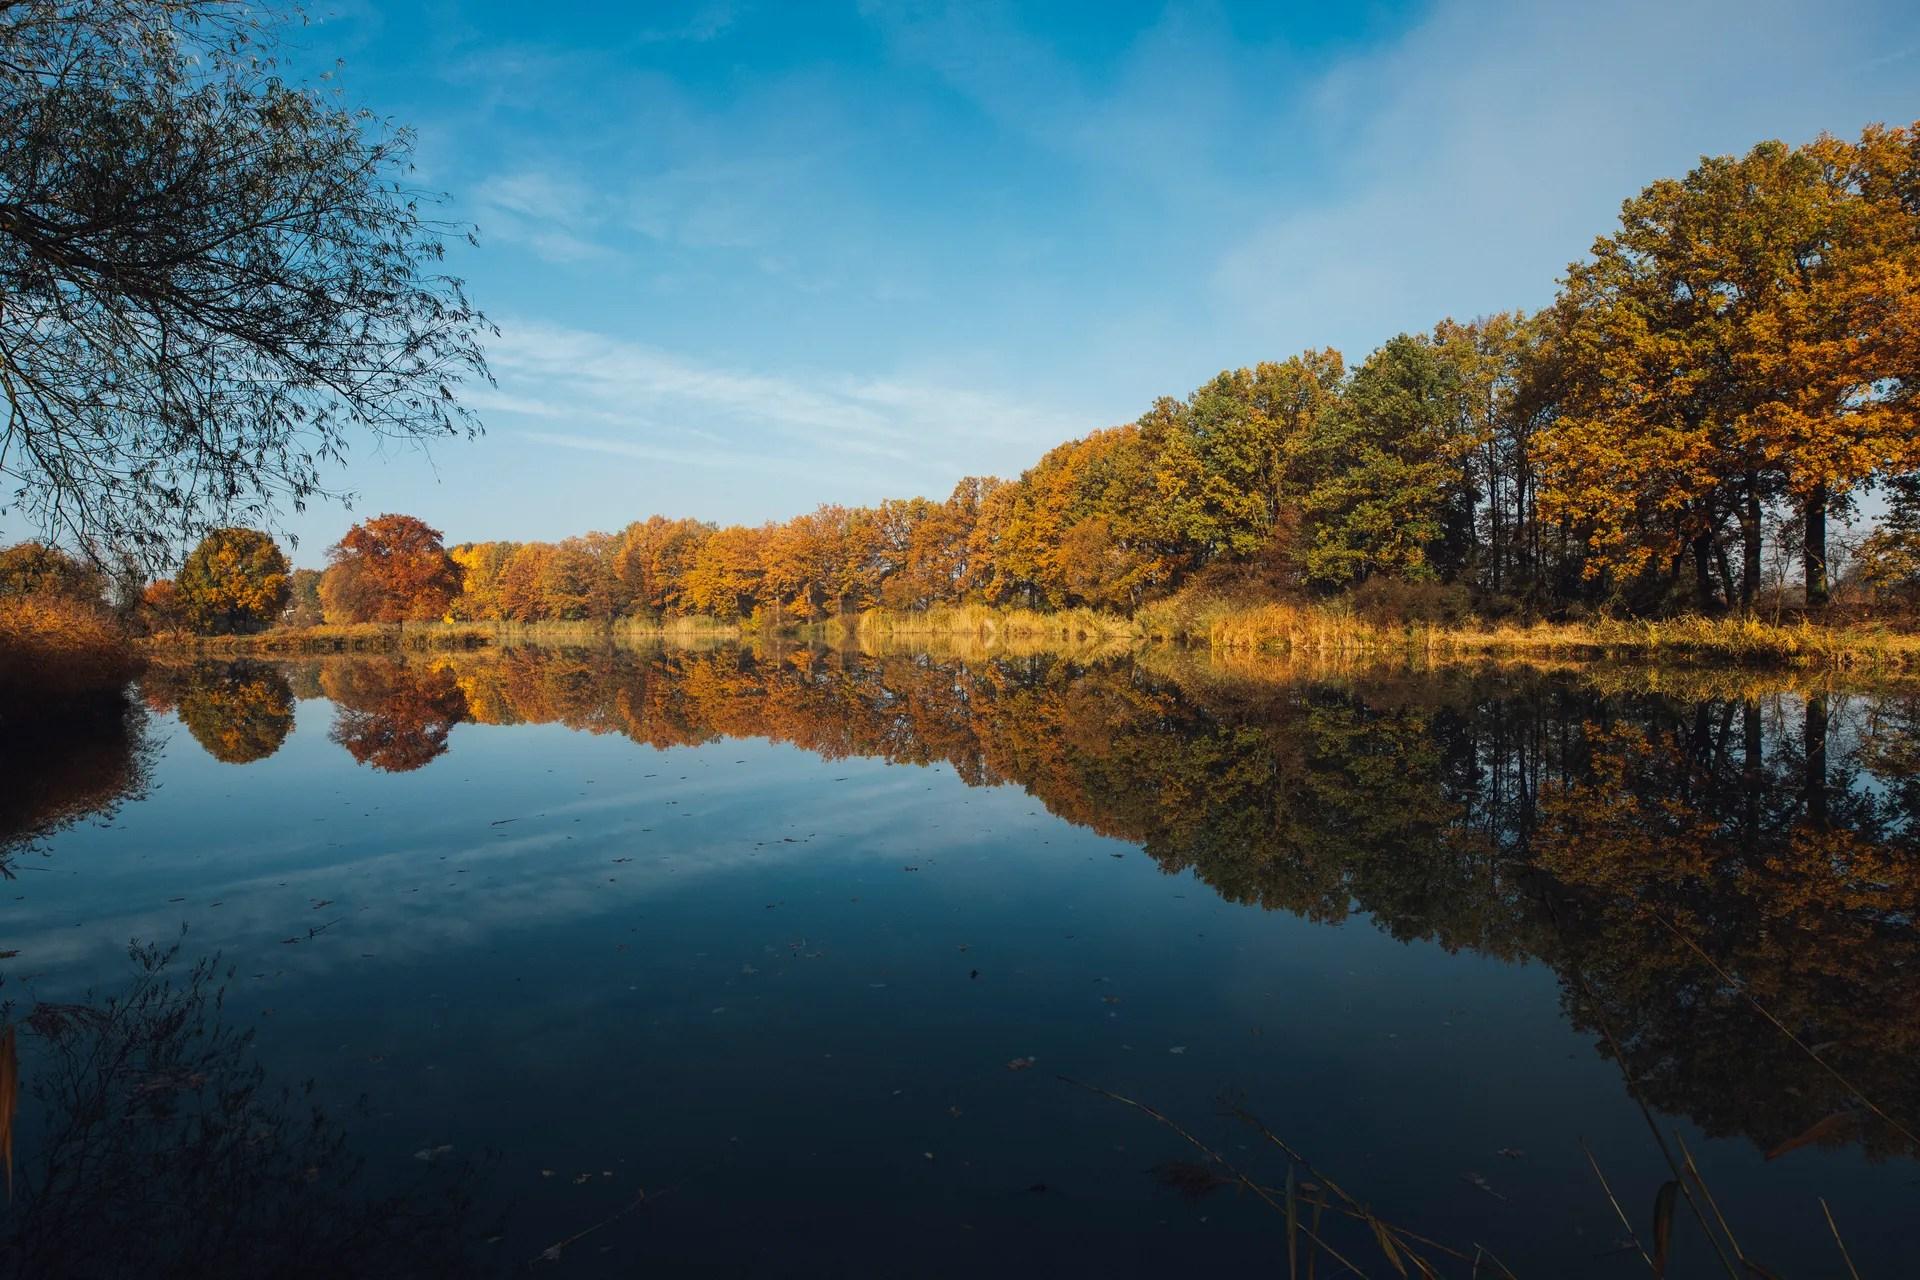 Cute Fall Background Wallpaper Japanese Table Decor Widescreen Wallpaper Wide